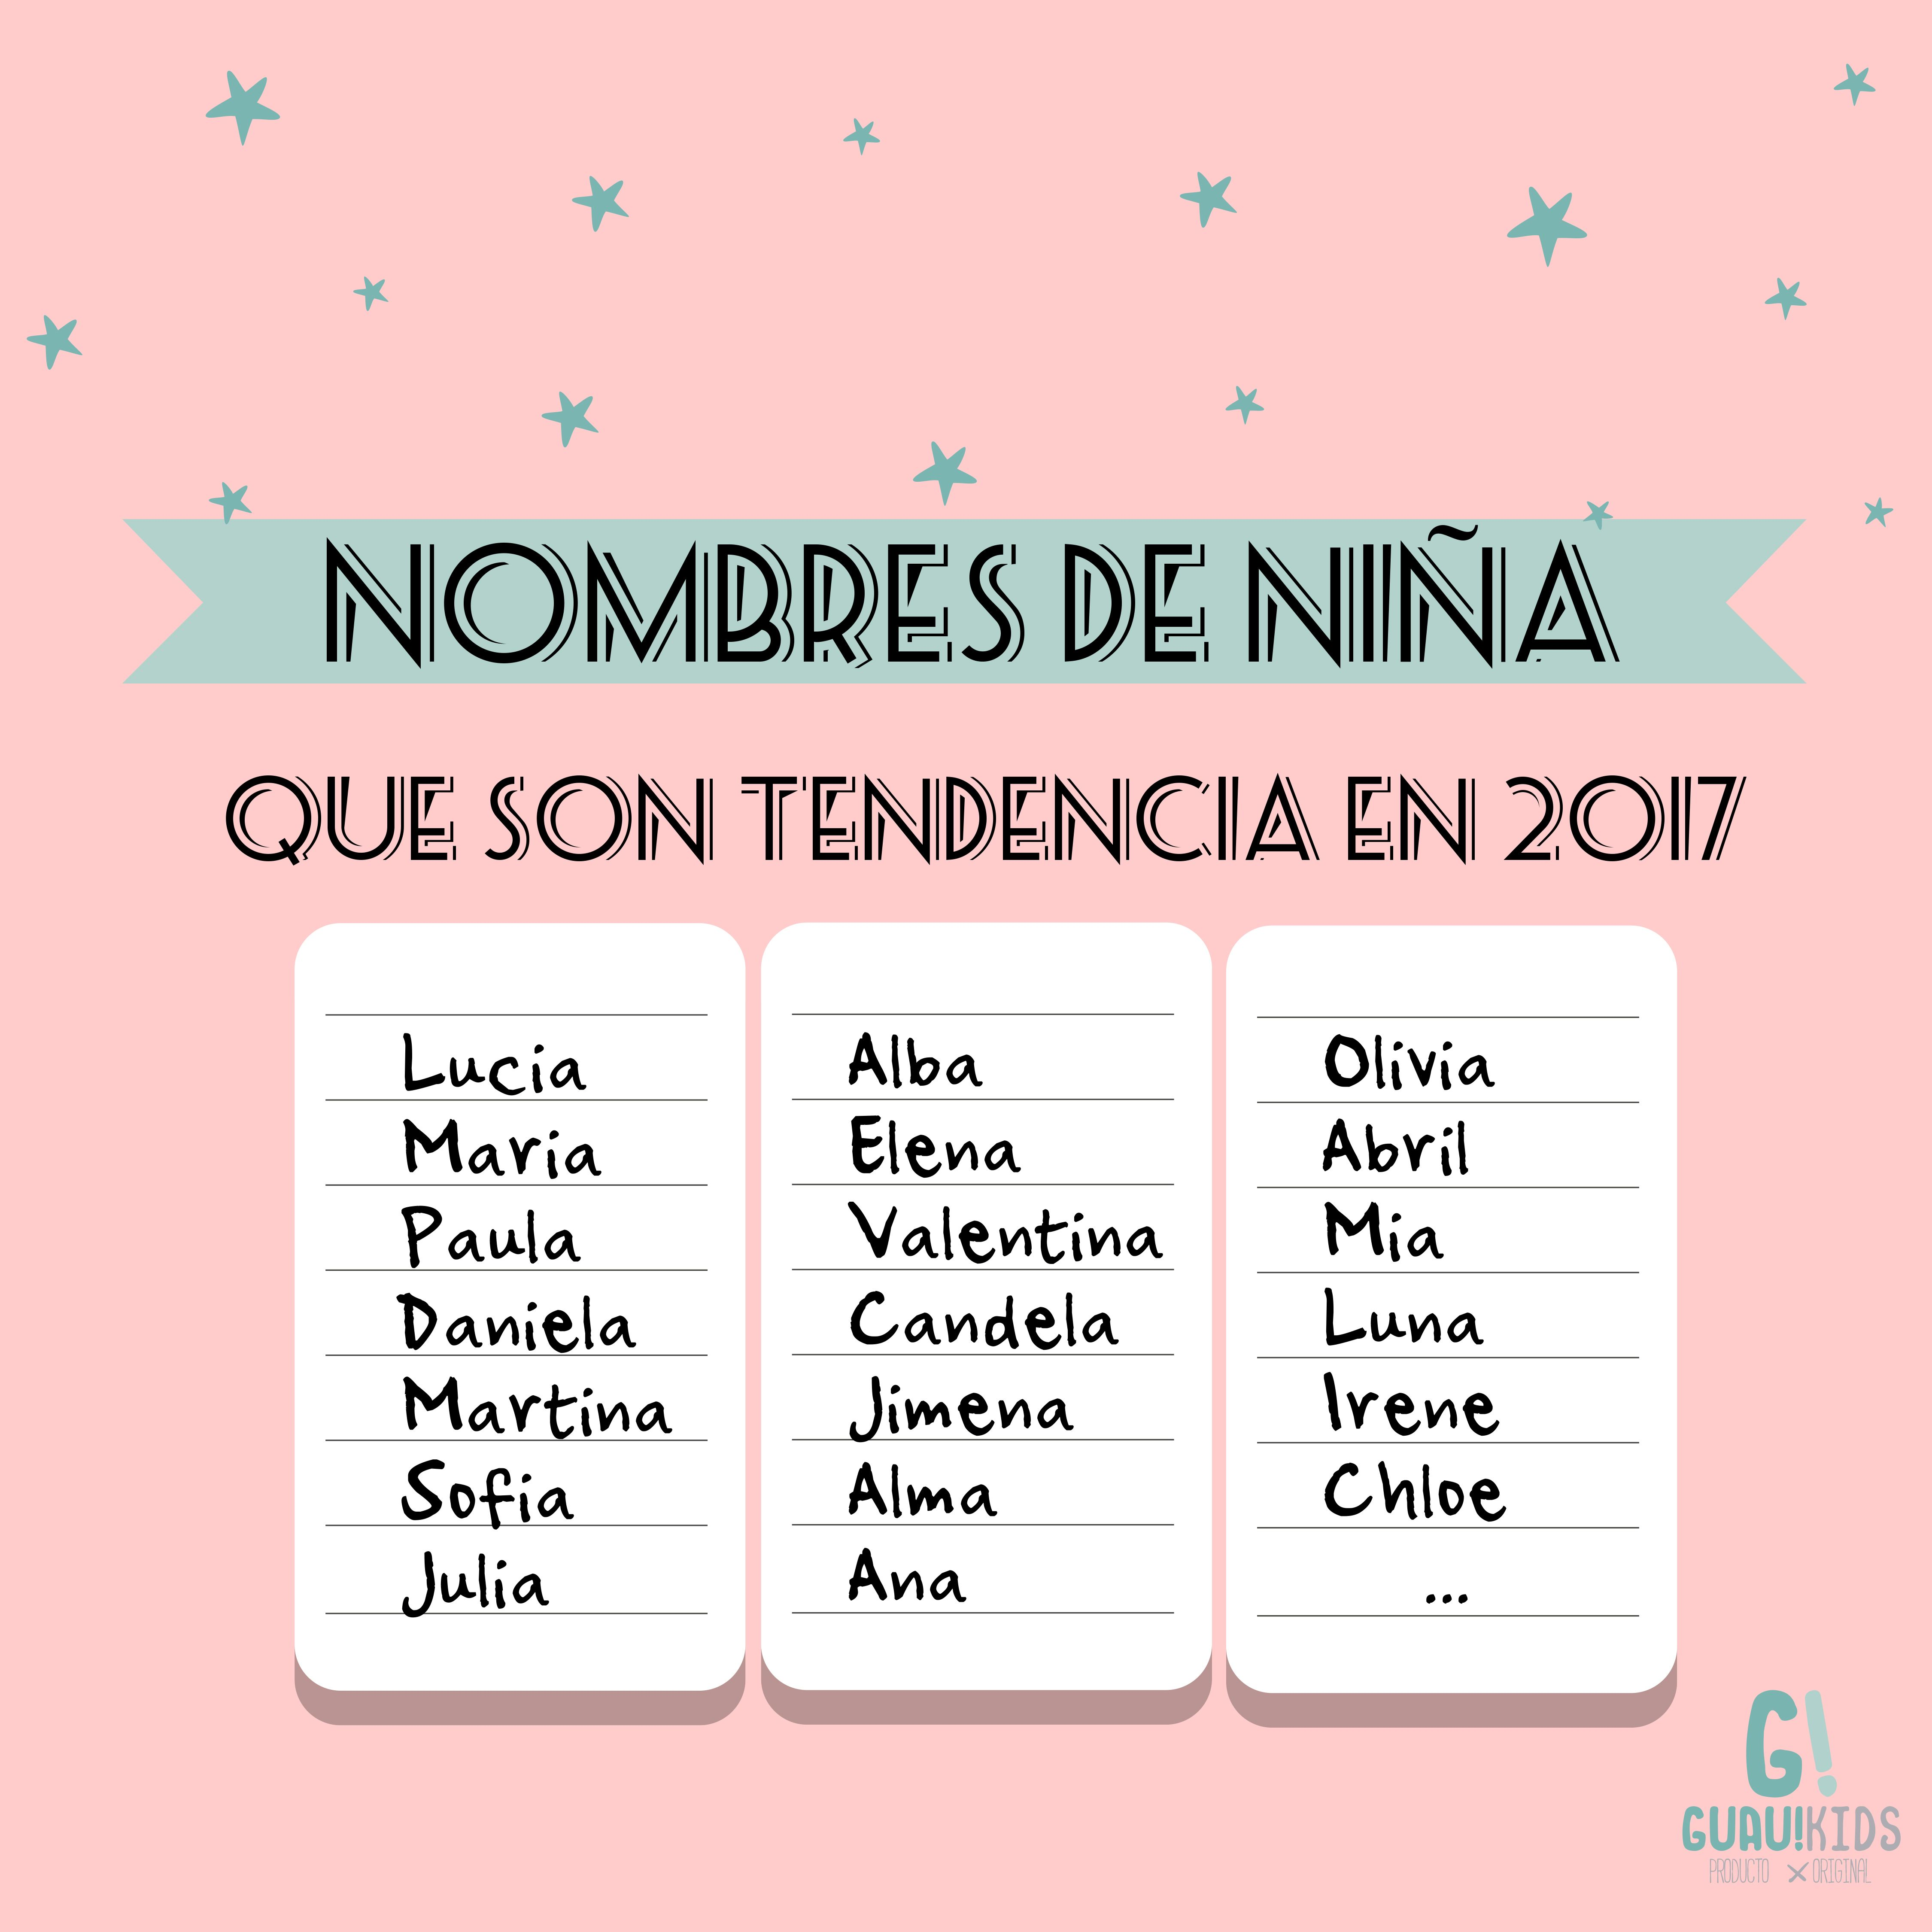 ¿Do you want to know the most trendy spanish names for girl in 2017? ¿Quieres conocer los nombre de niña que son tendencia en 2017? #naming #newborn #newname #ideas #newmom #newborn